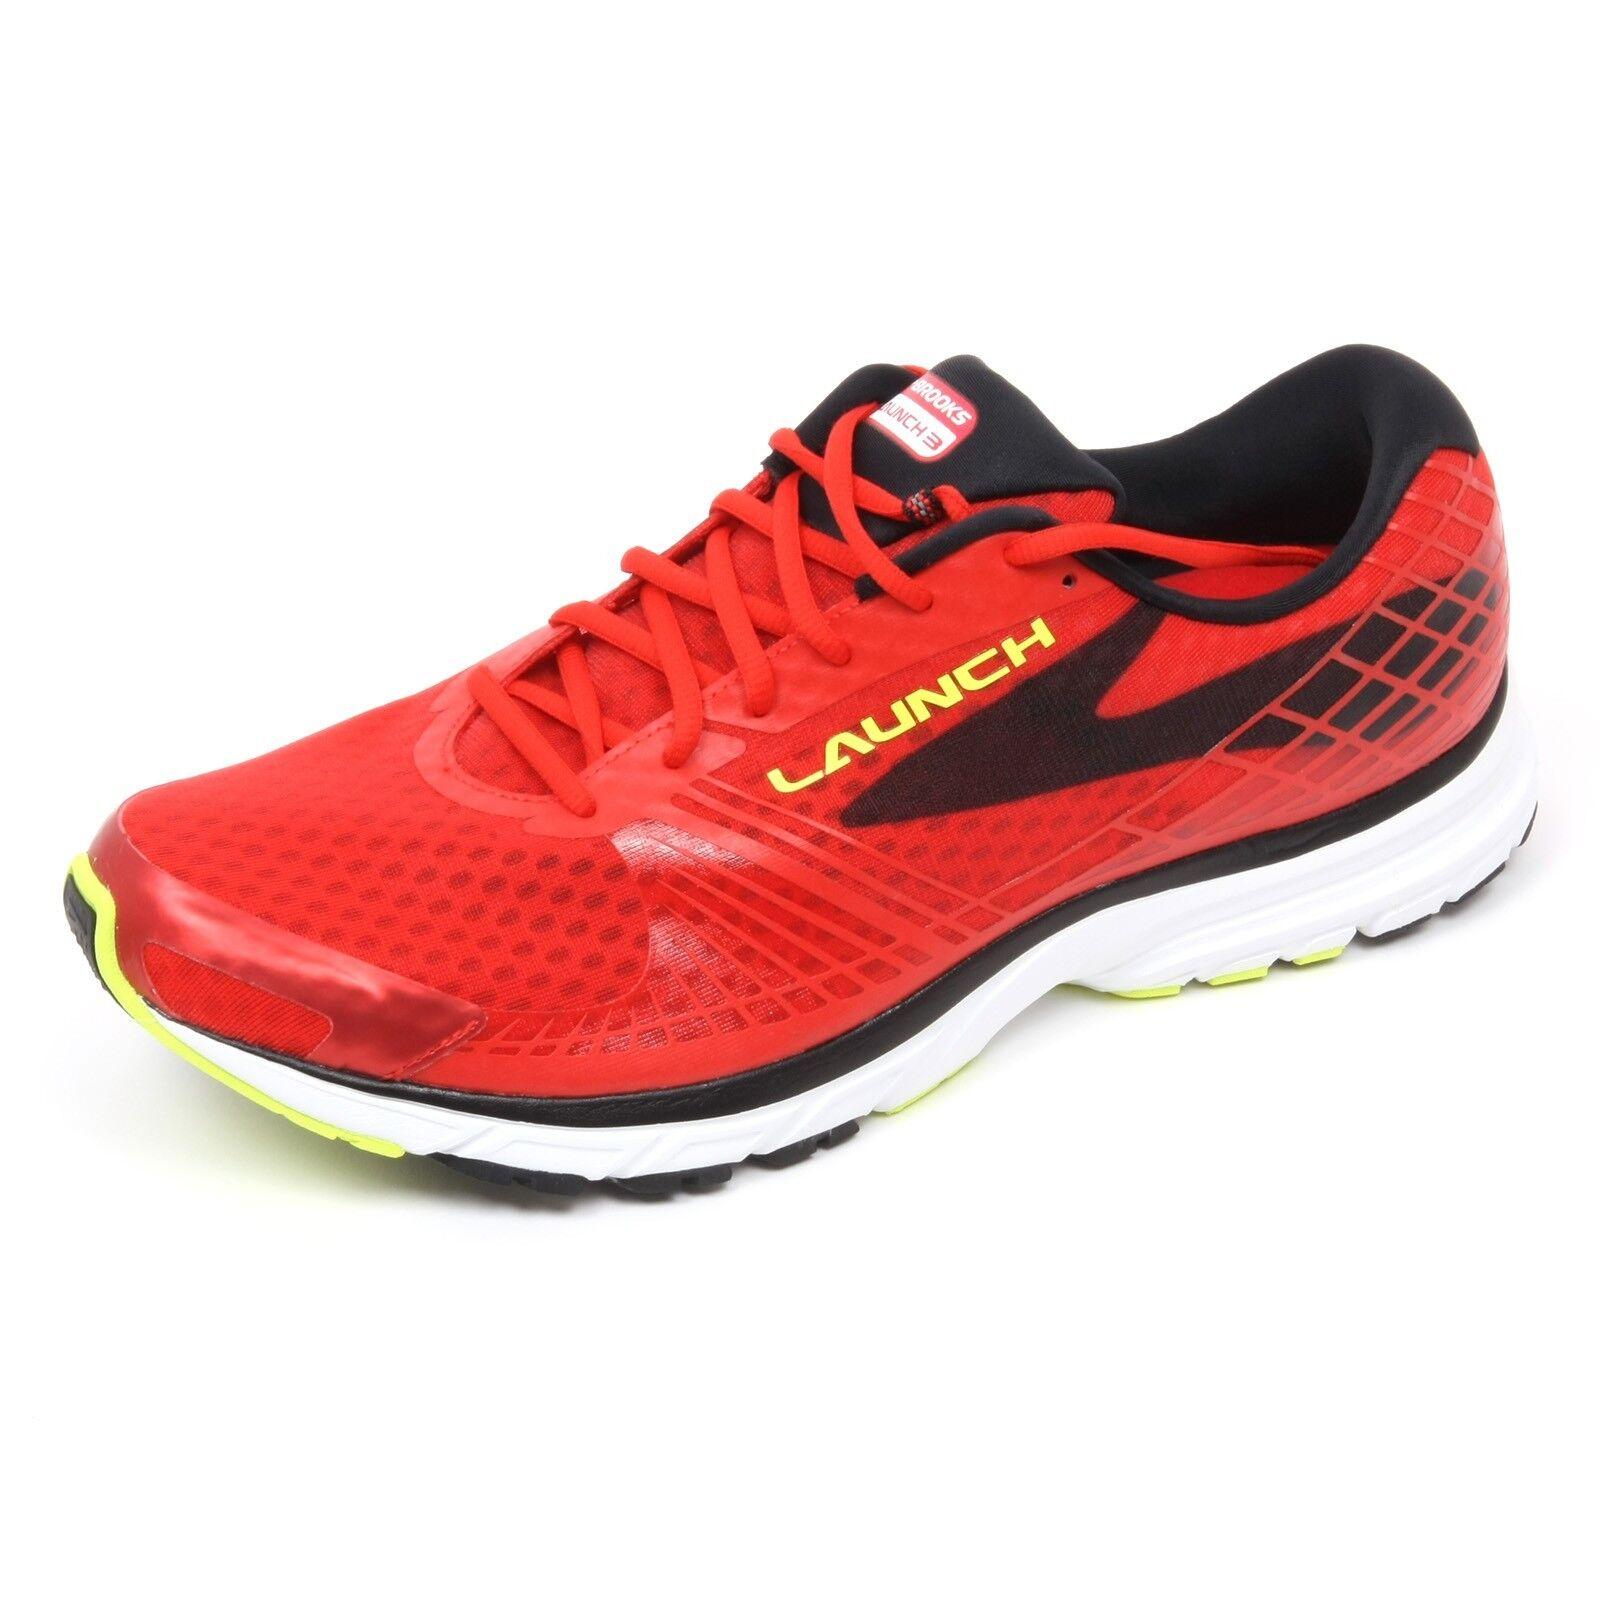 C4882 sneaker uomo BROOKS LAUNCH 3 rosso/nero shoe man